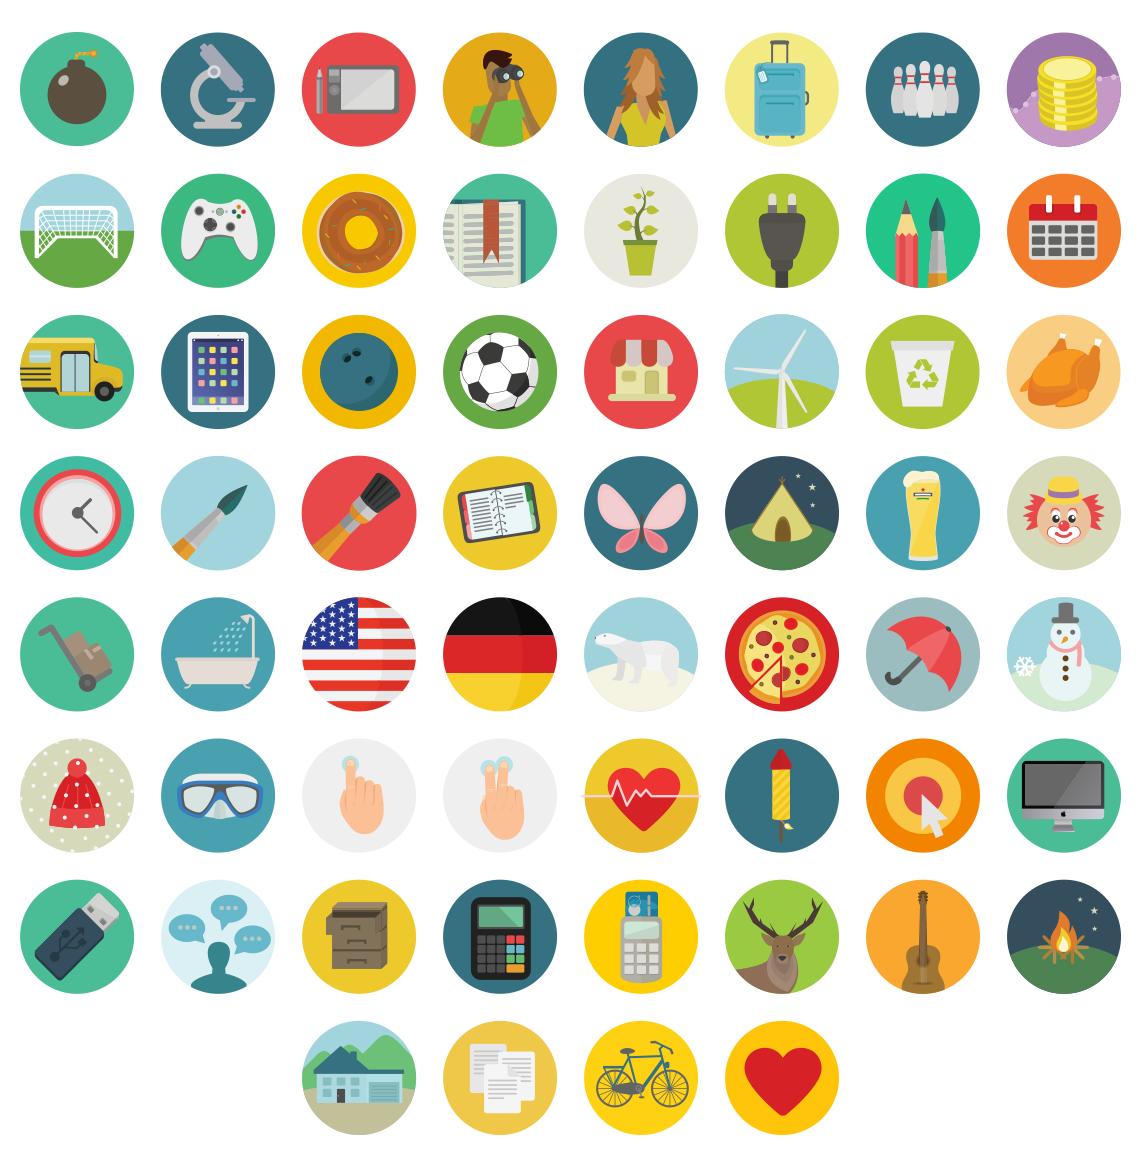 12 Flat Round Icons Images